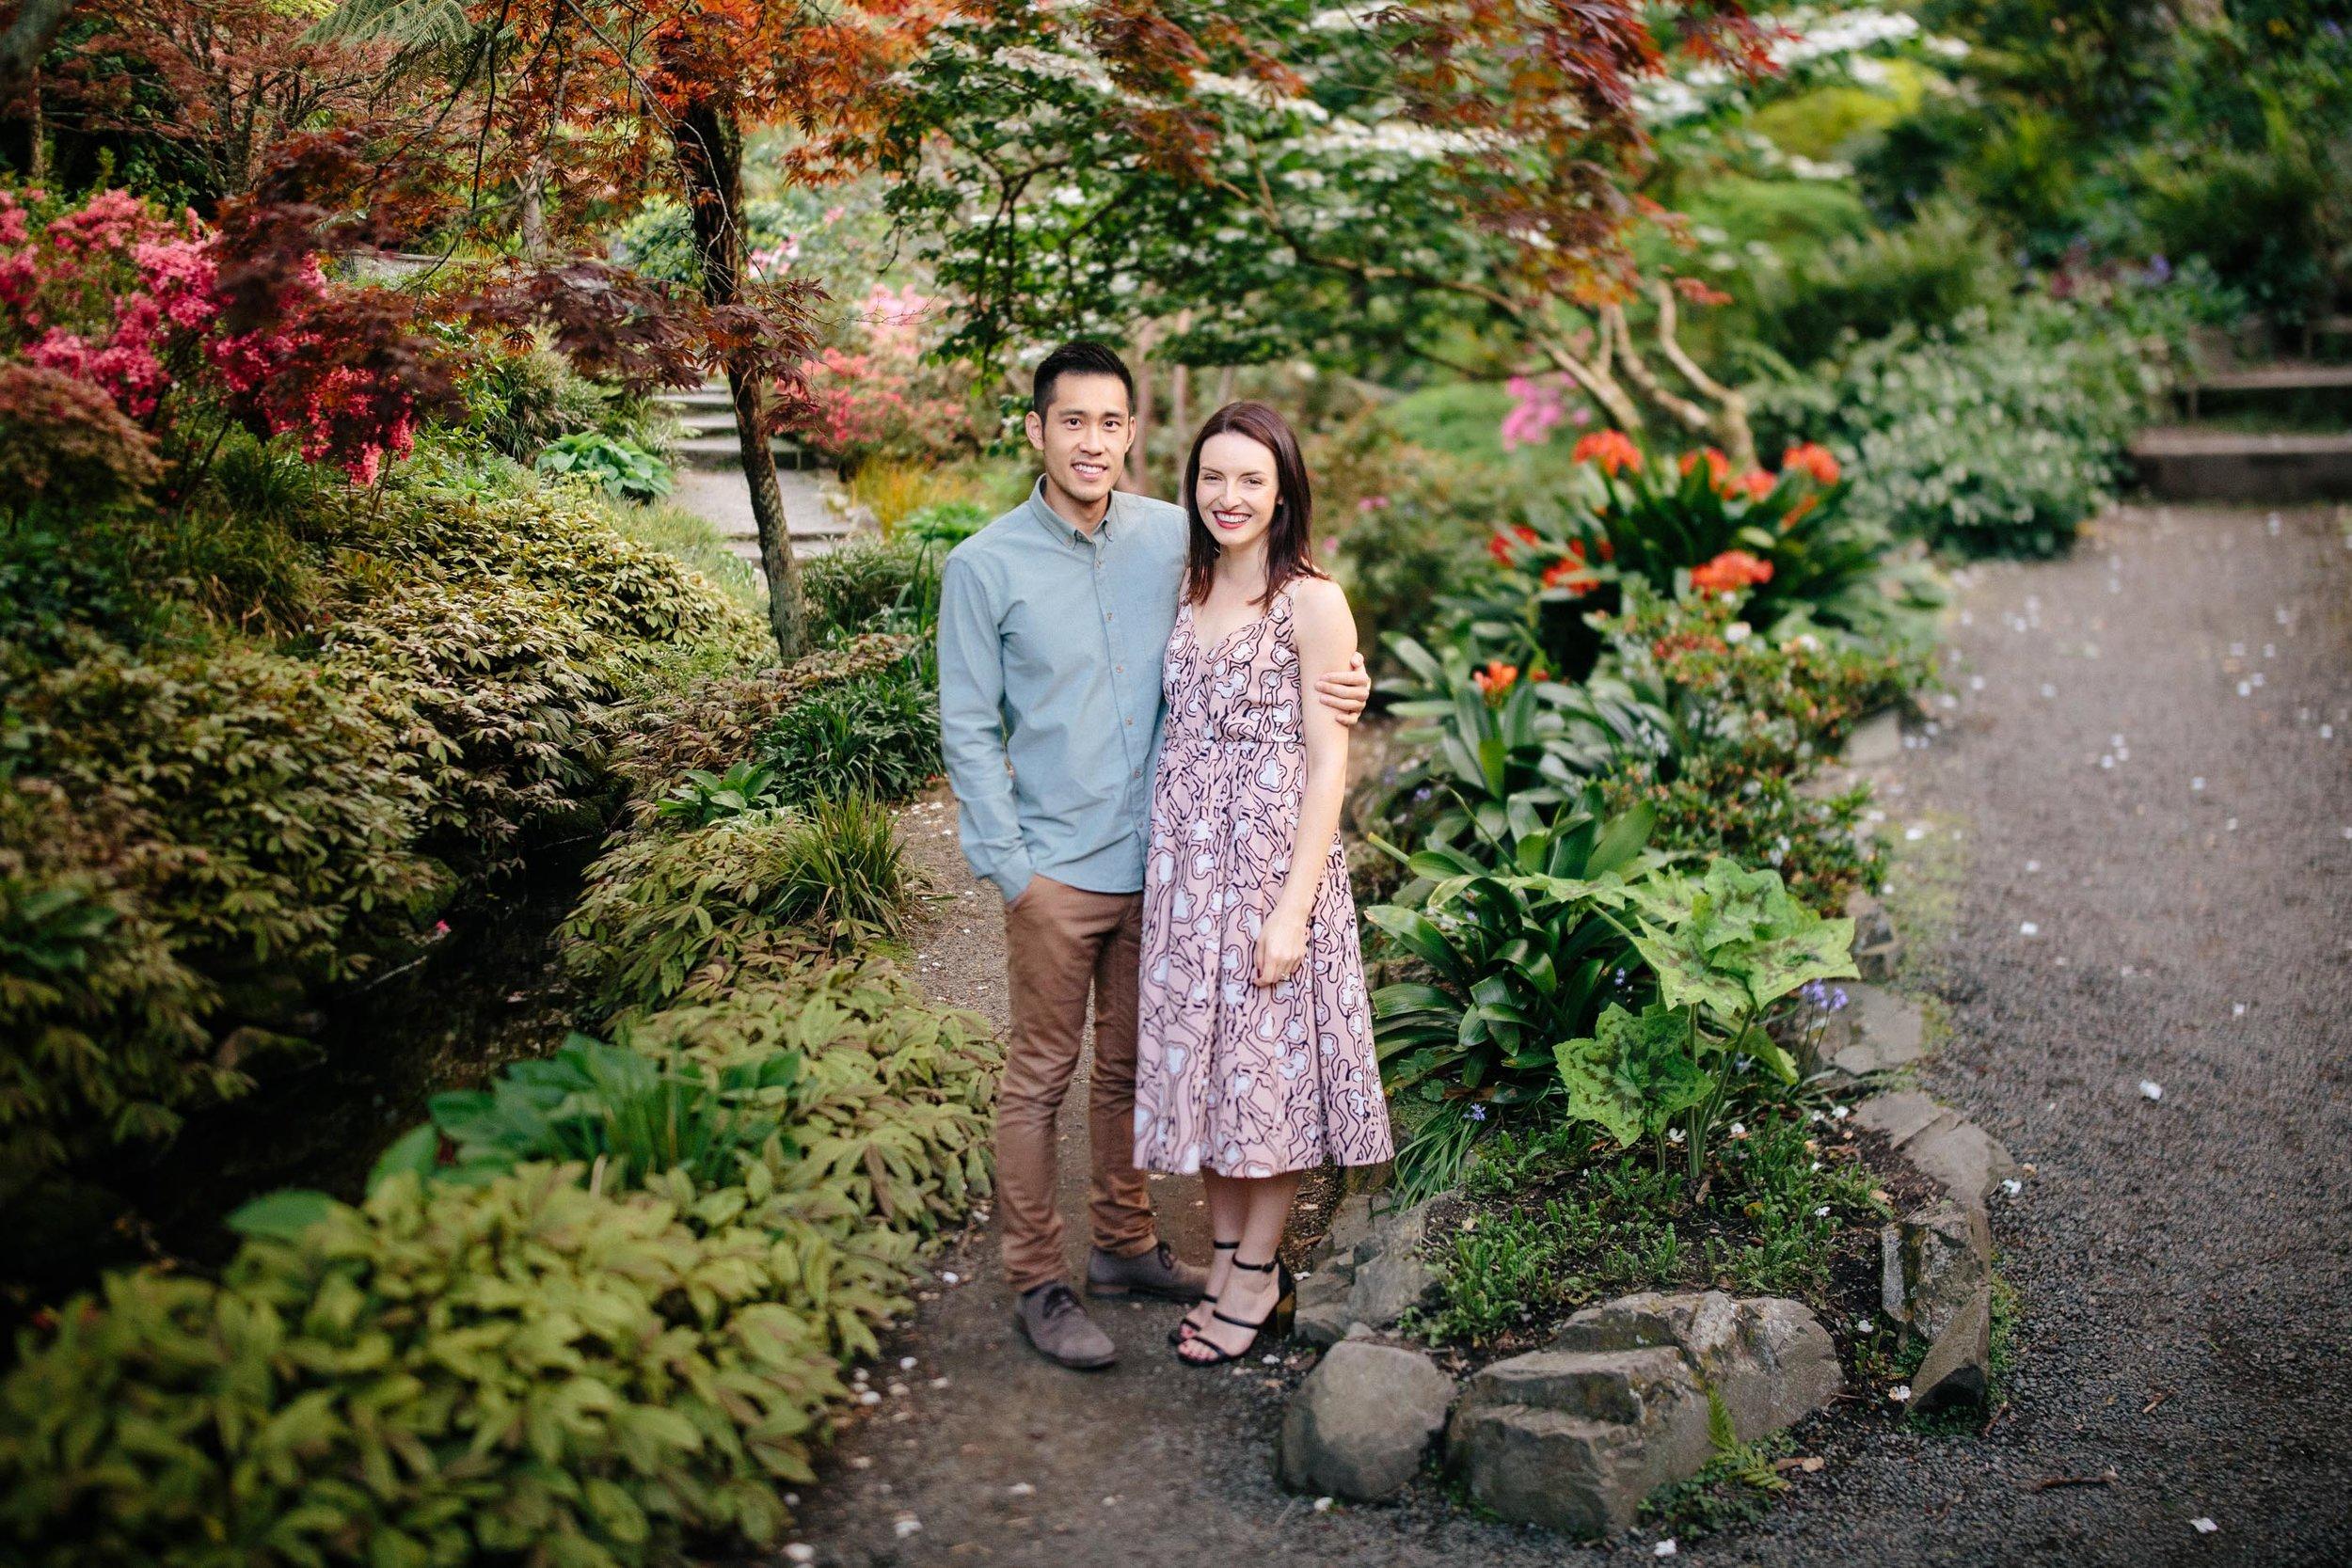 BotanicGardens-22.jpg